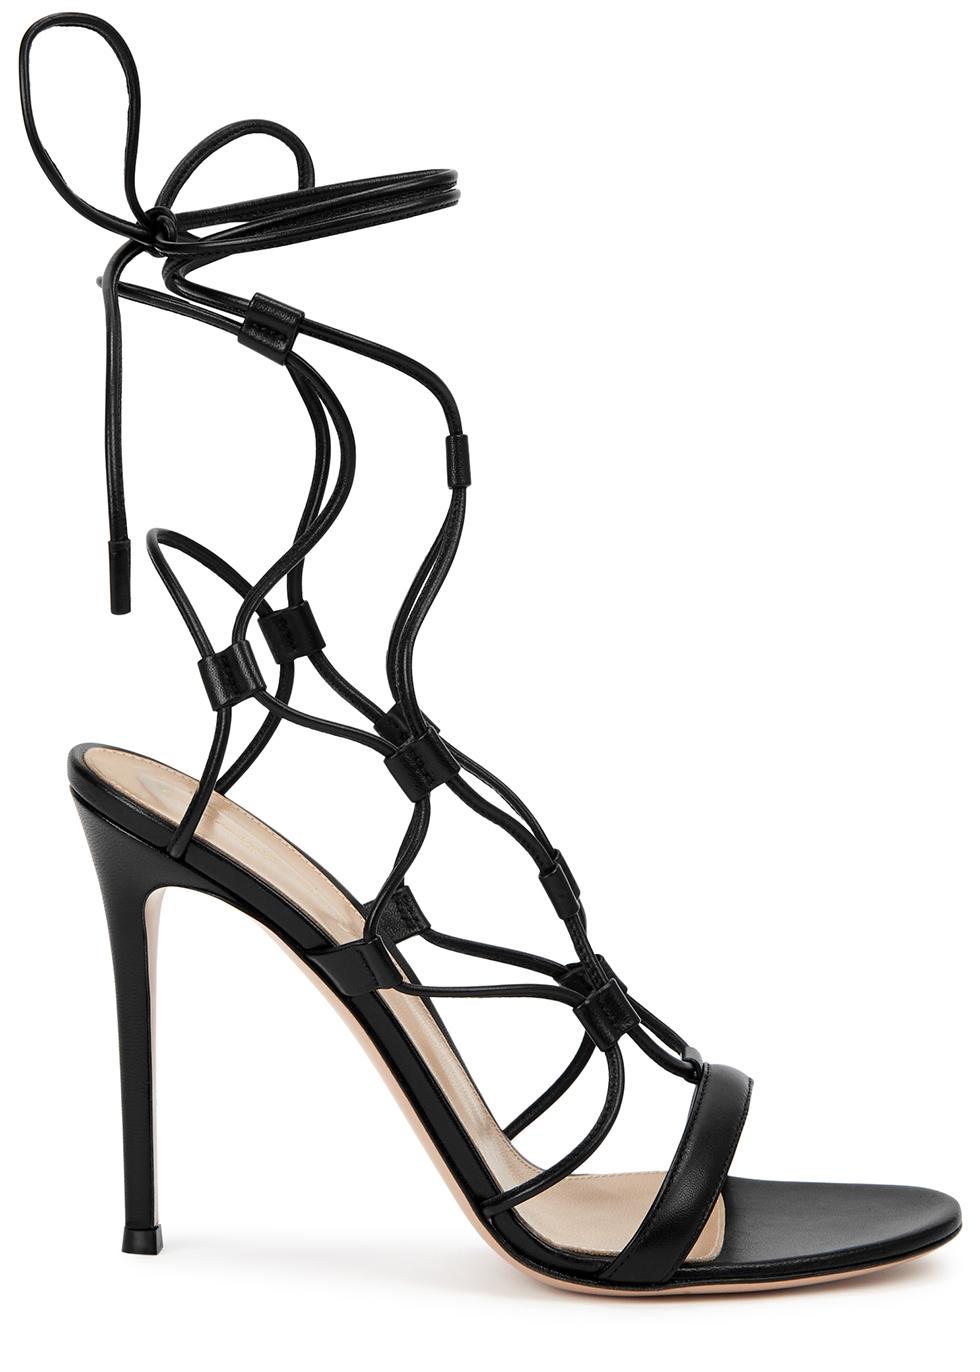 Giza 105 black leather sandals